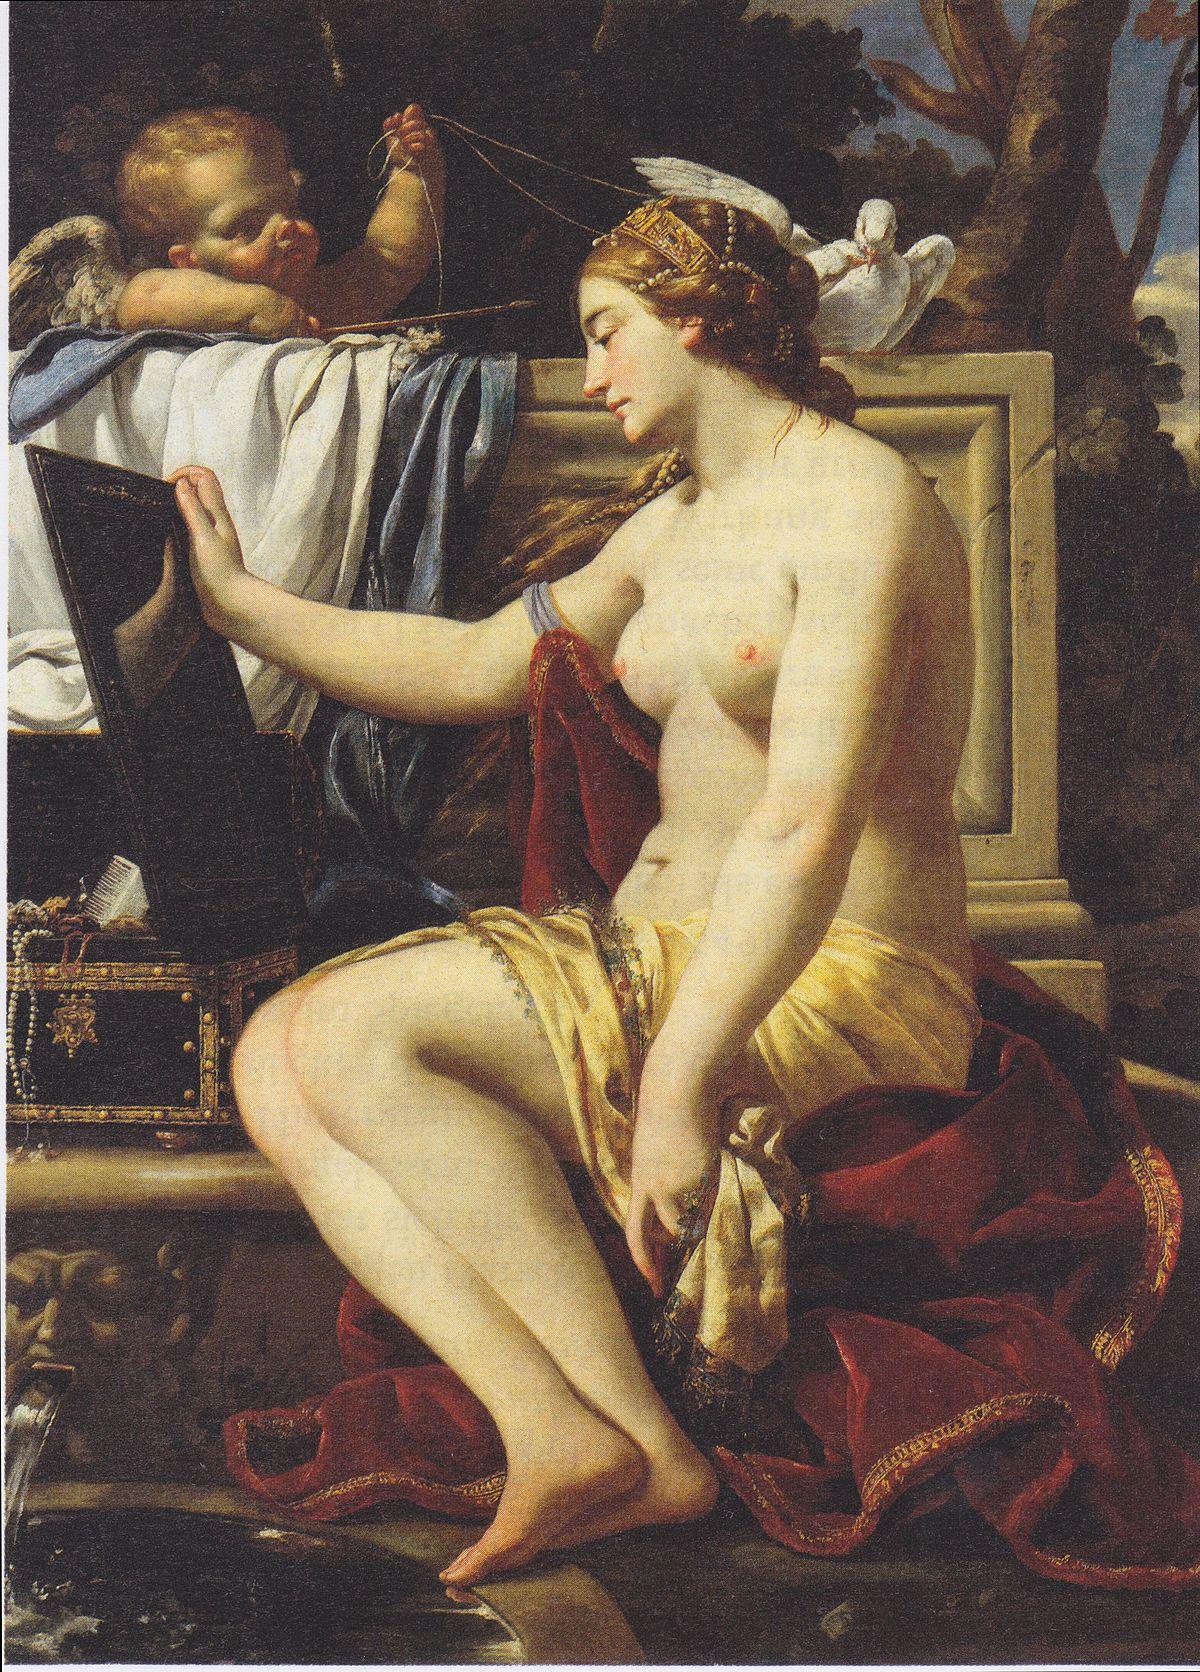 http://upload.wikimedia.org/wikipedia/commons/thumb/f/f2/Simon_Vouet_-_Die_Toilette_der_Venus_1625-27.jpeg/1200px-Simon_Vouet_-_Die_Toilette_der_Venus_1625-27.jpeg